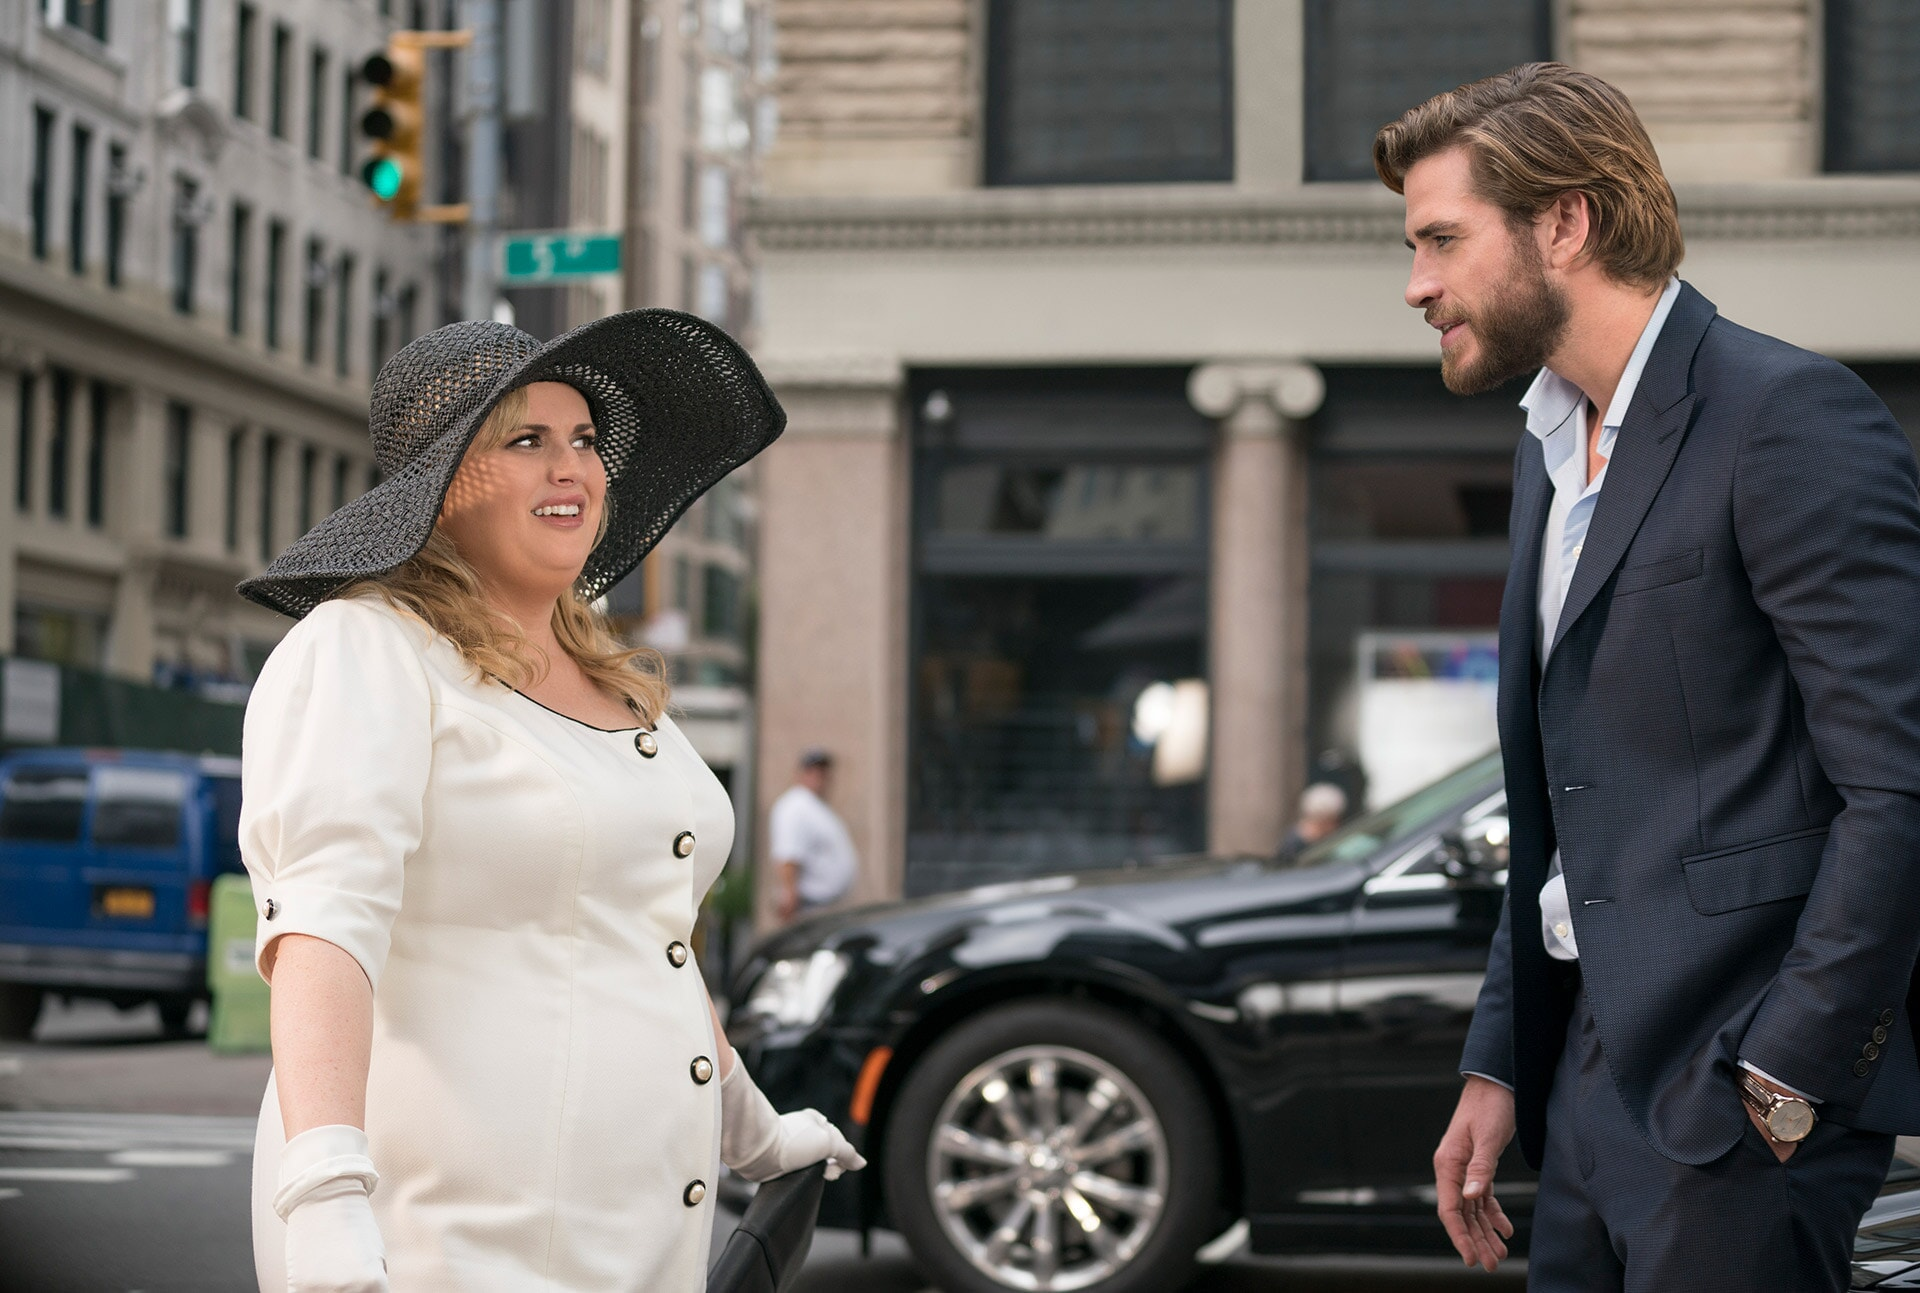 (L-R) REBEL WILSON as Natalie and LIAM HEMSWORTH as Blake